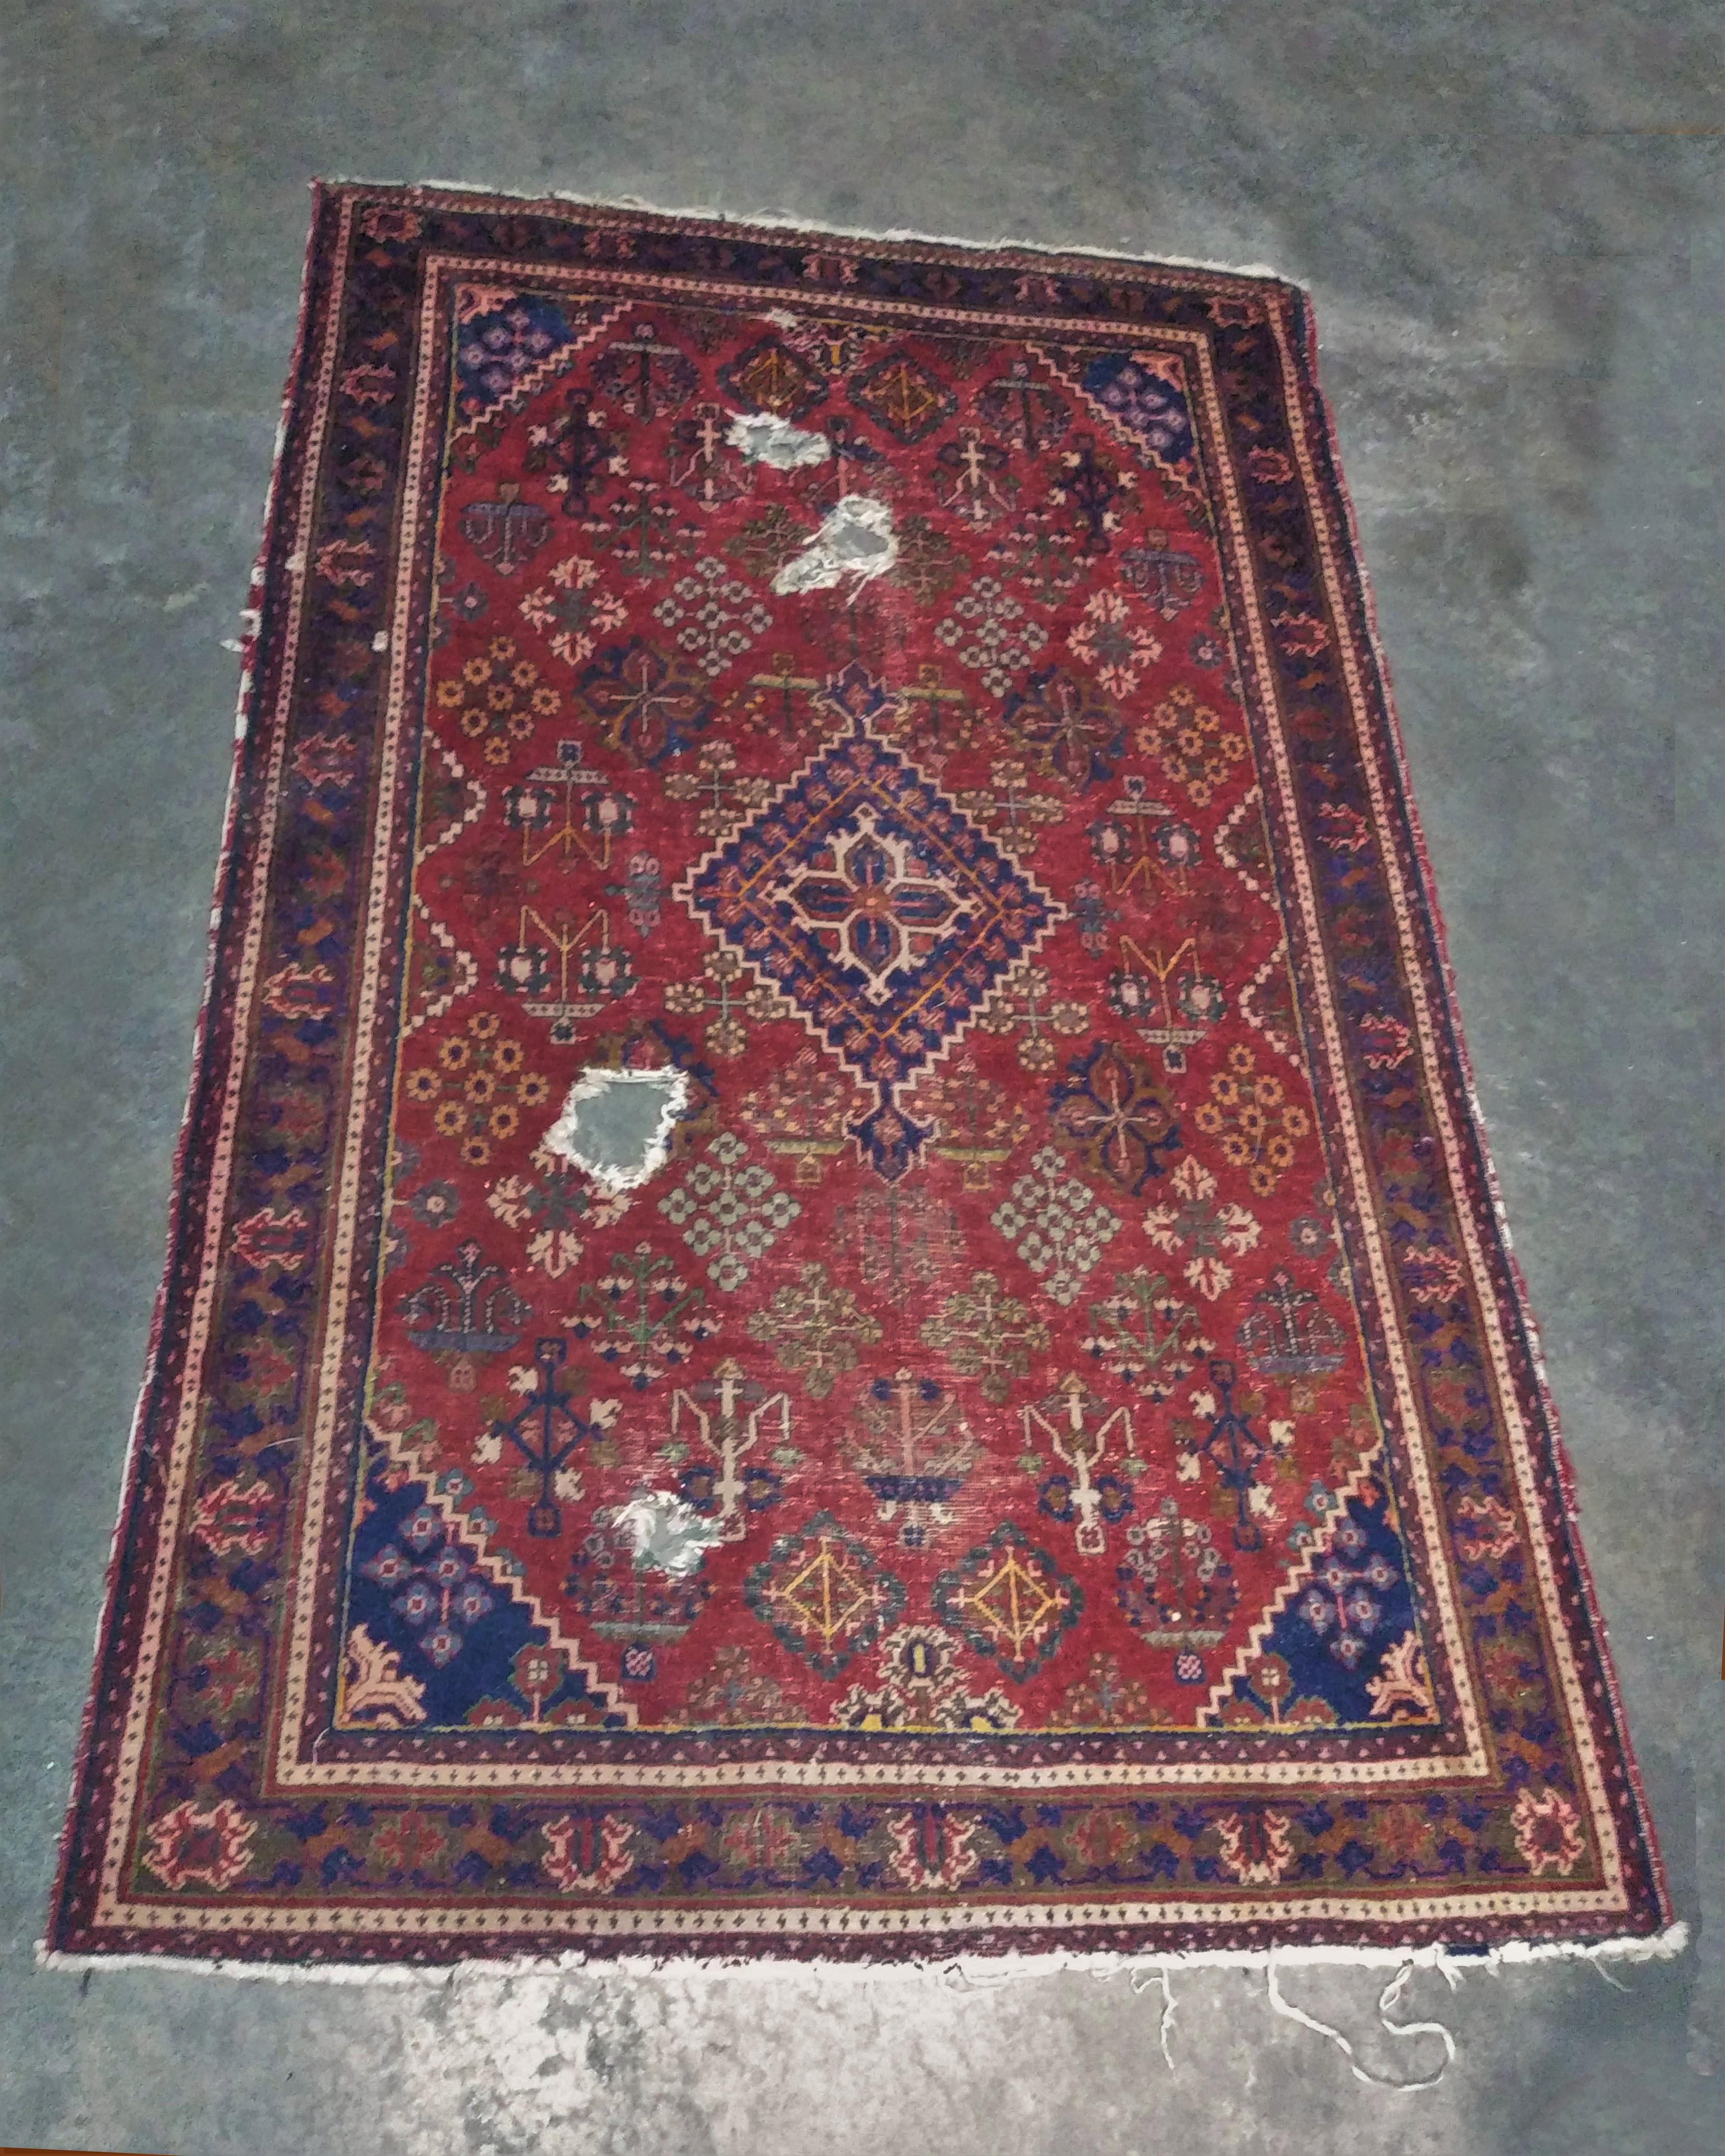 Theadbare Oriental Rug - small